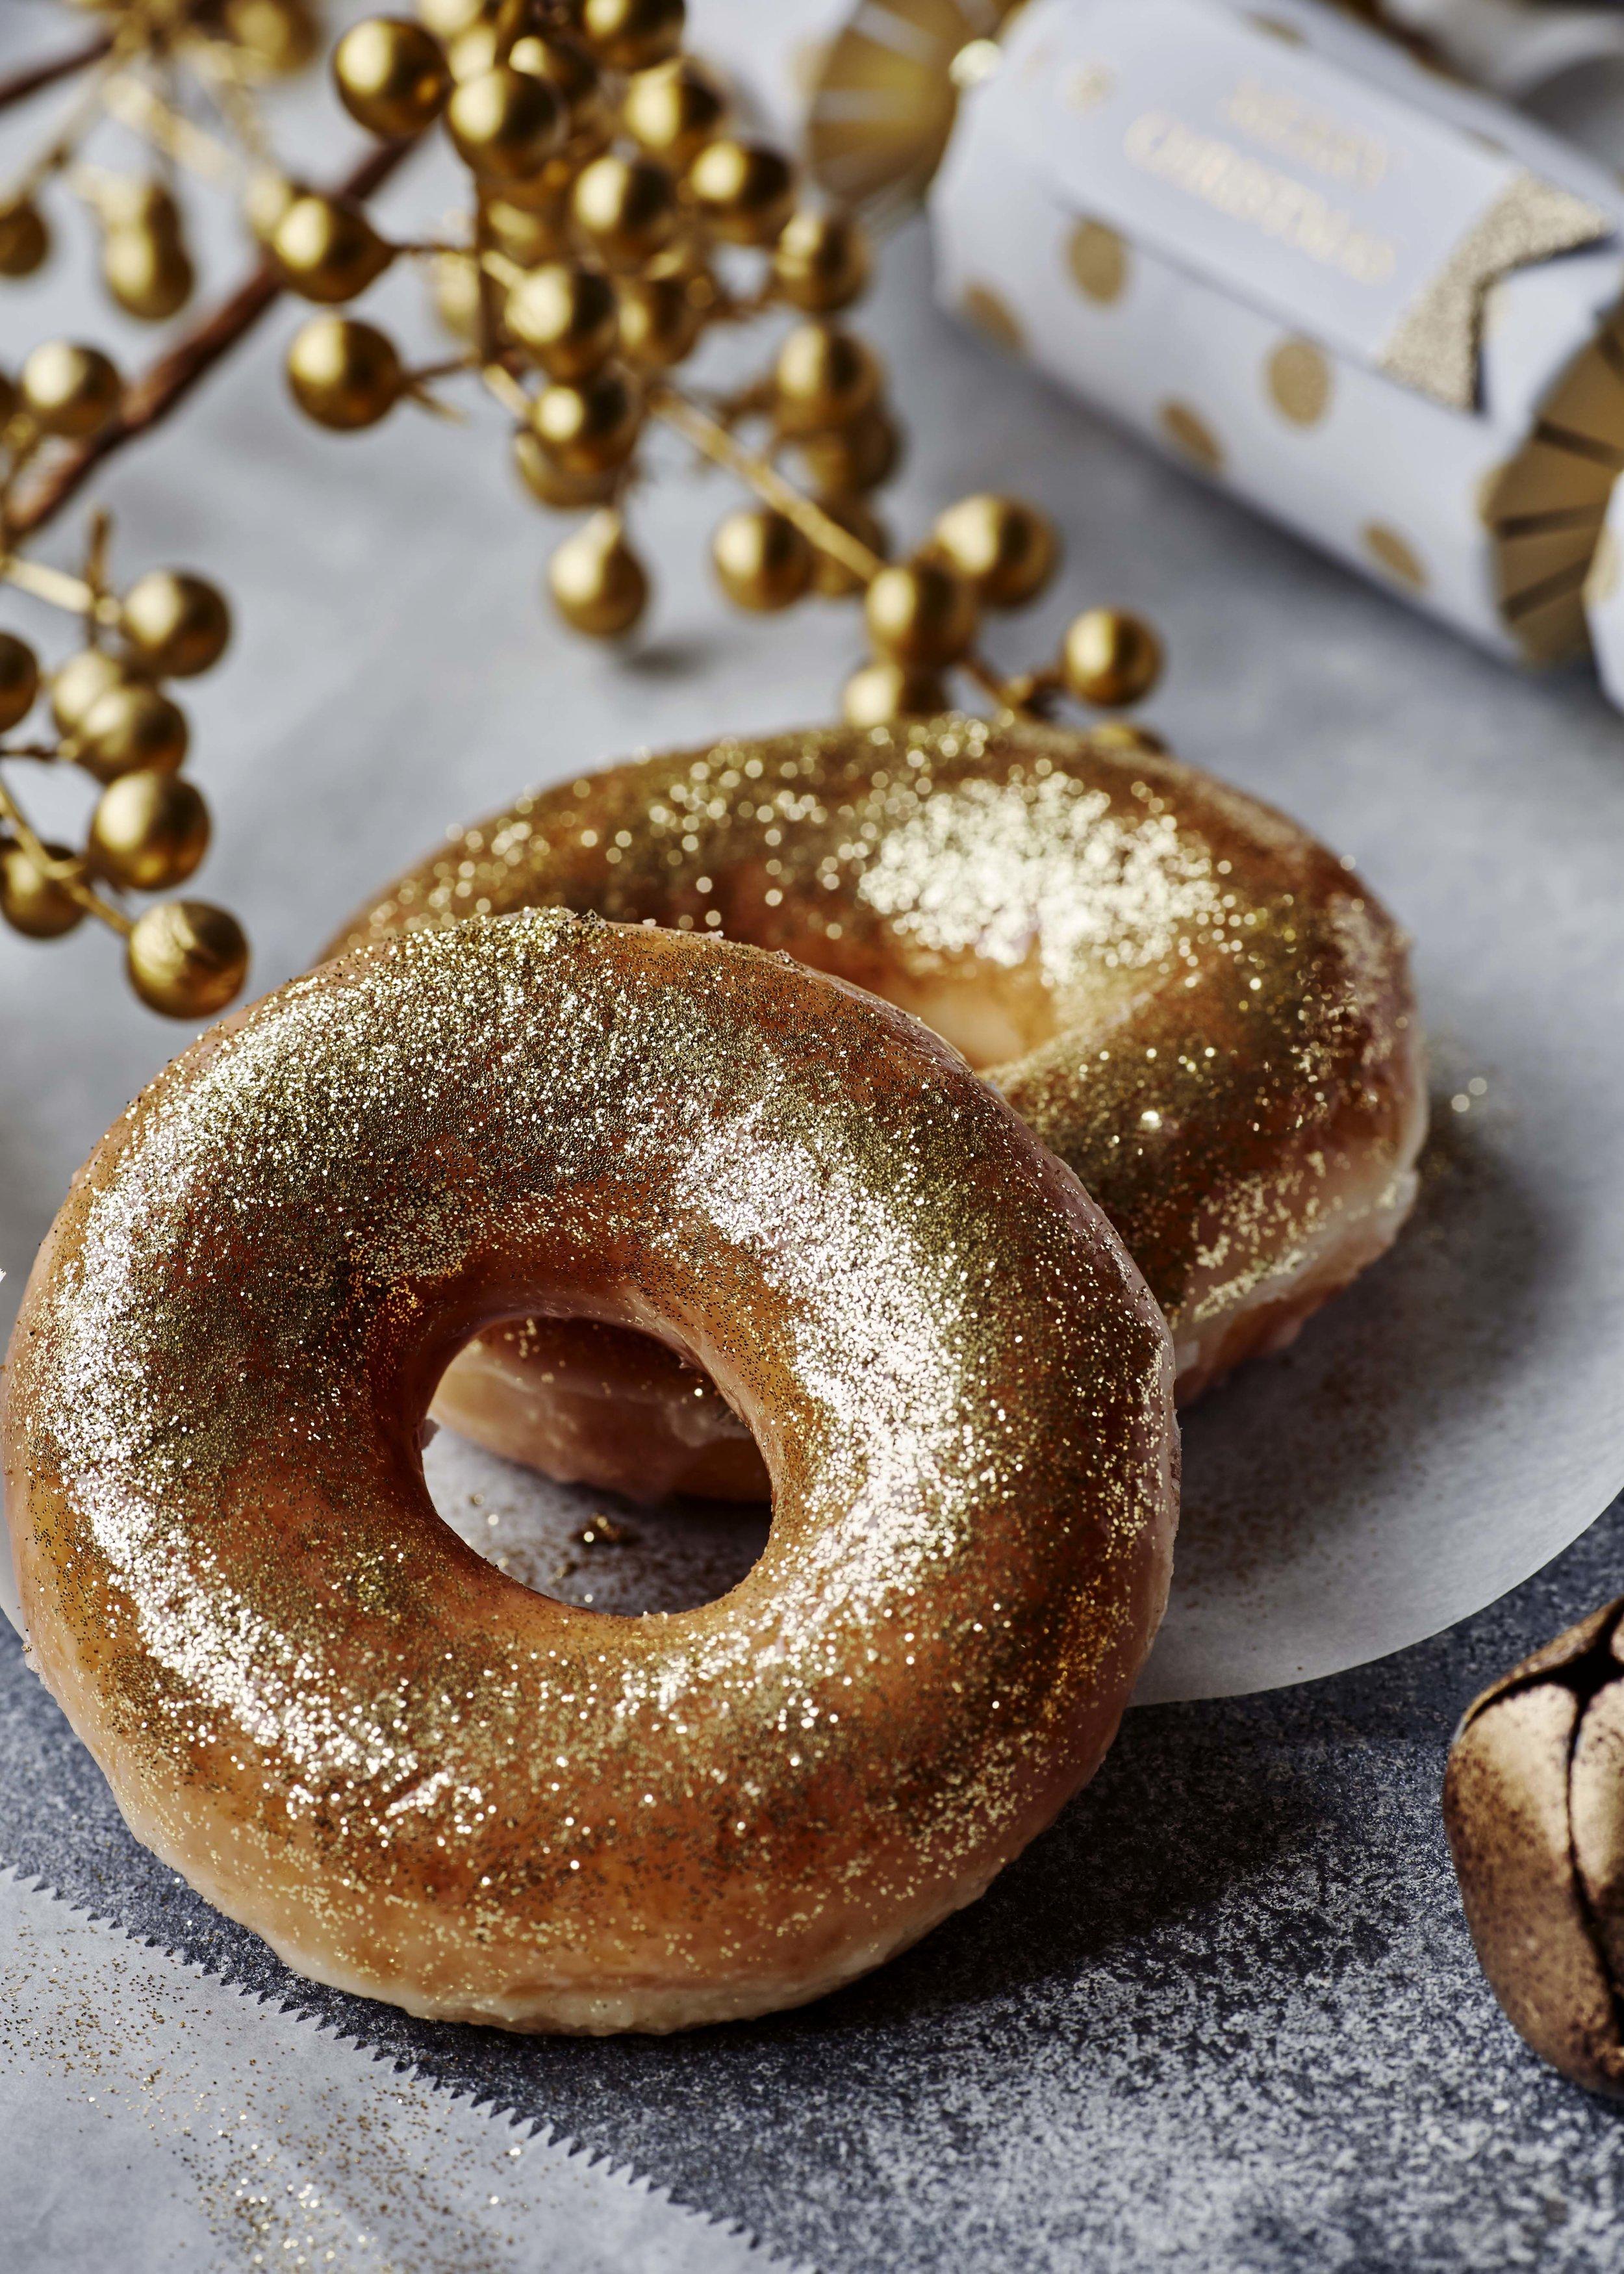 Liz_Cooper_Interior_Interiors_Still_LIfe_Props_Stylist_food_christmas_doughnuts.jpg